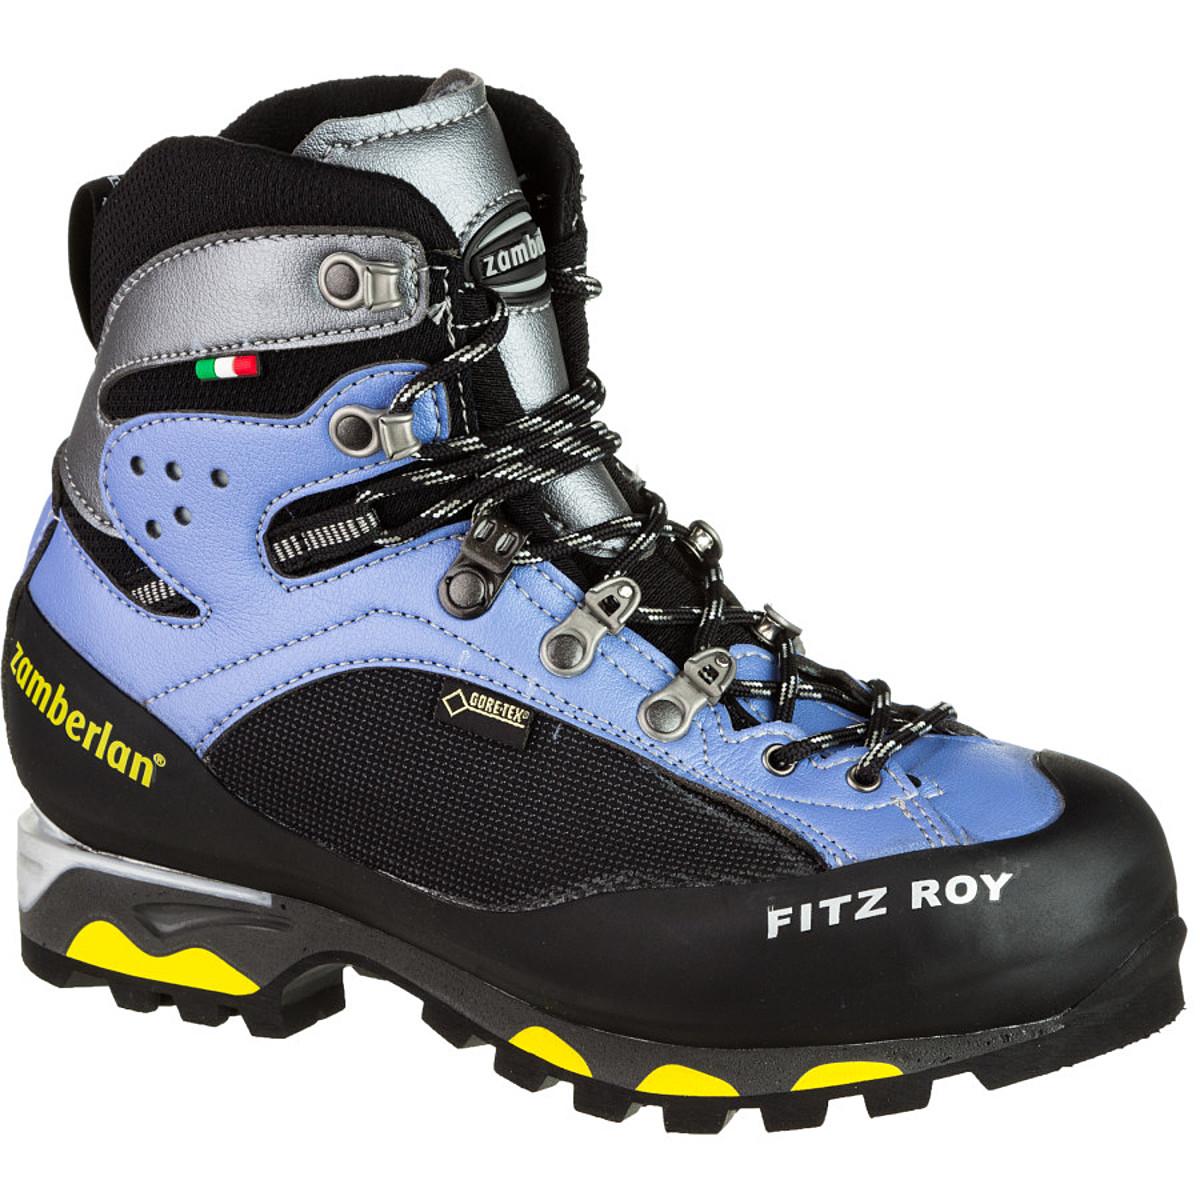 Zamberlan 2050 Fitz Roy GTX RR